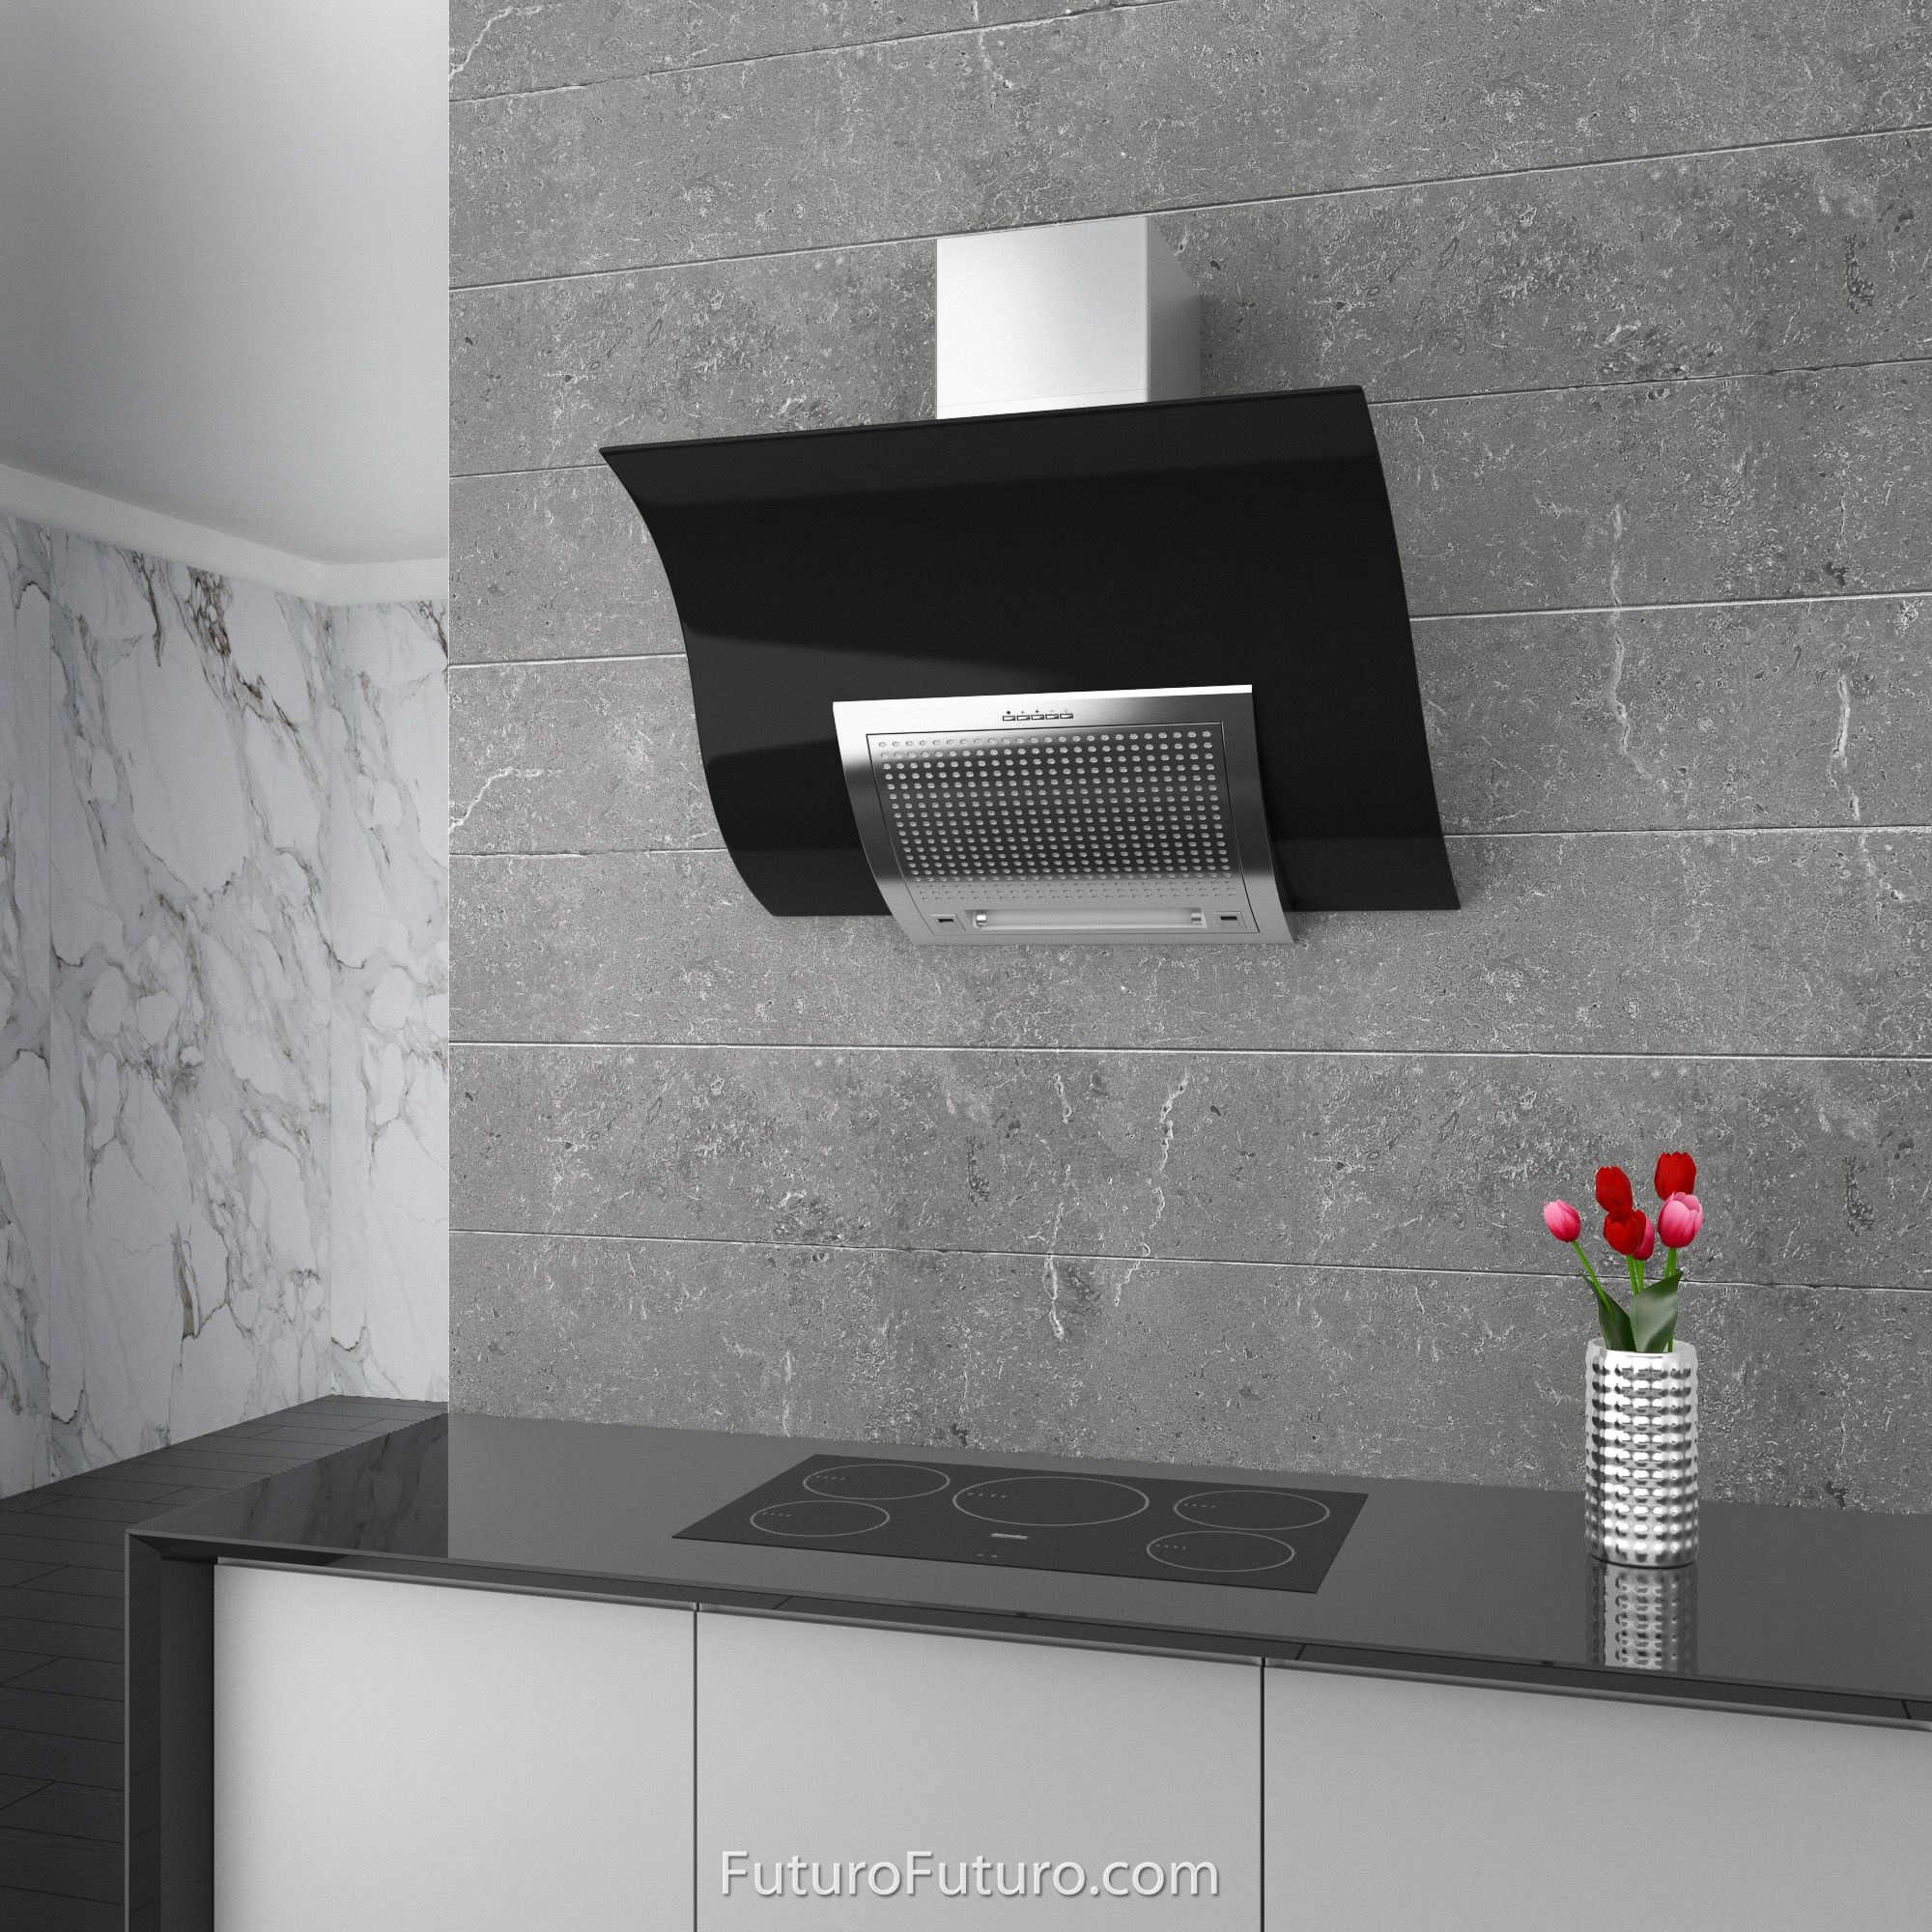 Range Hood 36 Inch Wave Black Wall Mount By Futuro Futuro In 2020 Black Walls Glass Panels Wall